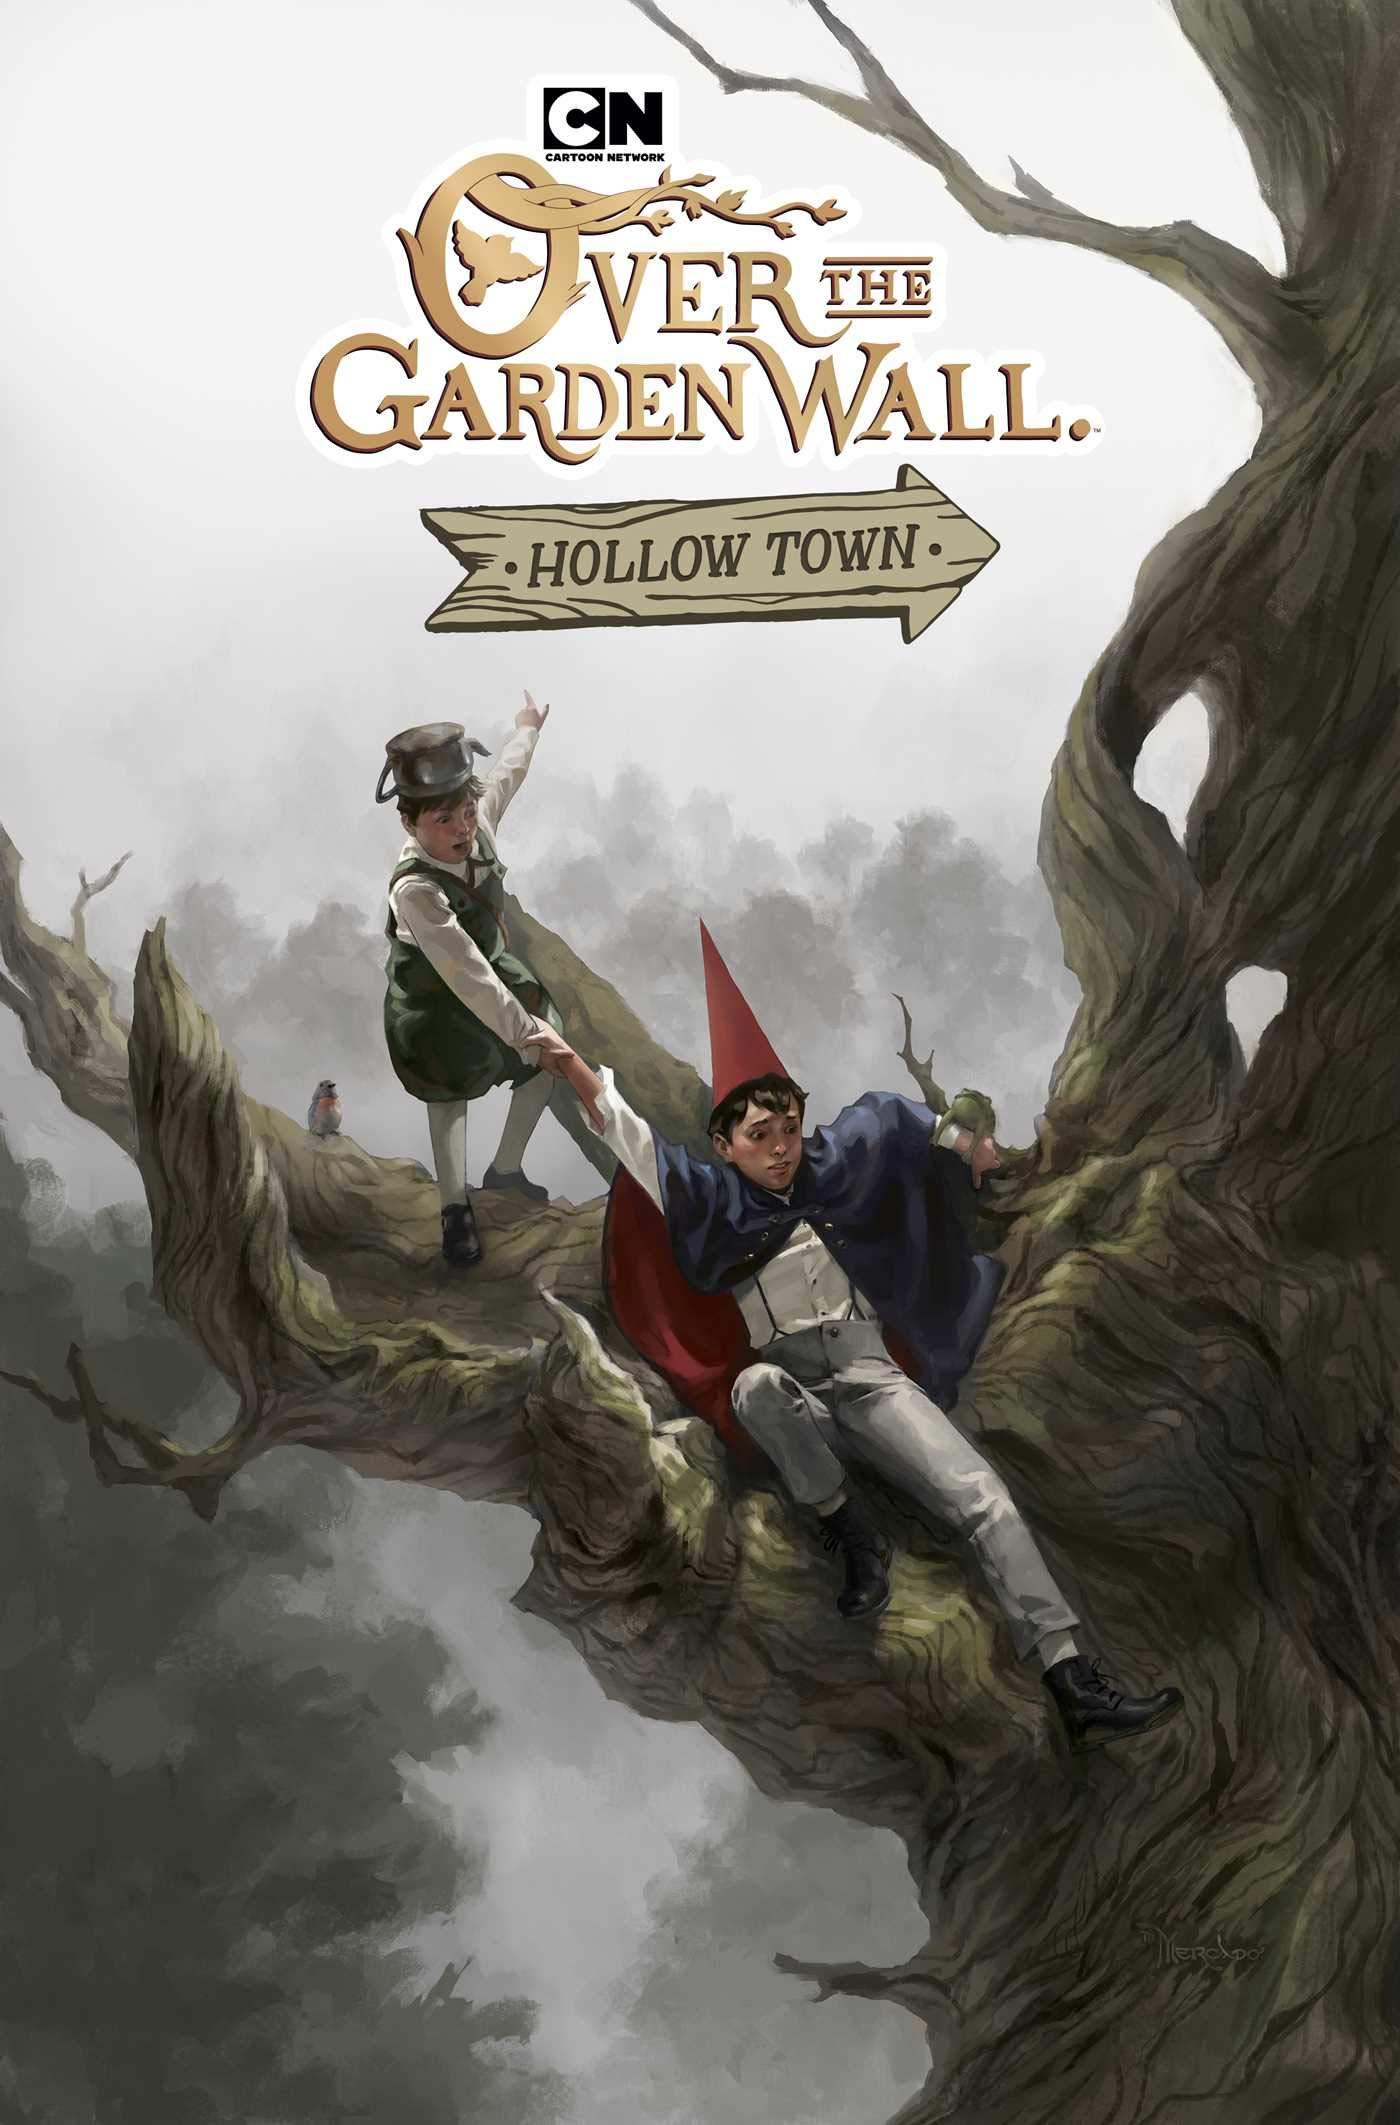 Over the Garden Wall: Hollow Town: 1: Amazon.es: Mchale, Pat, Lowenthal, Celia, Monlongo, Jorge: Libros en idiomas extranjeros